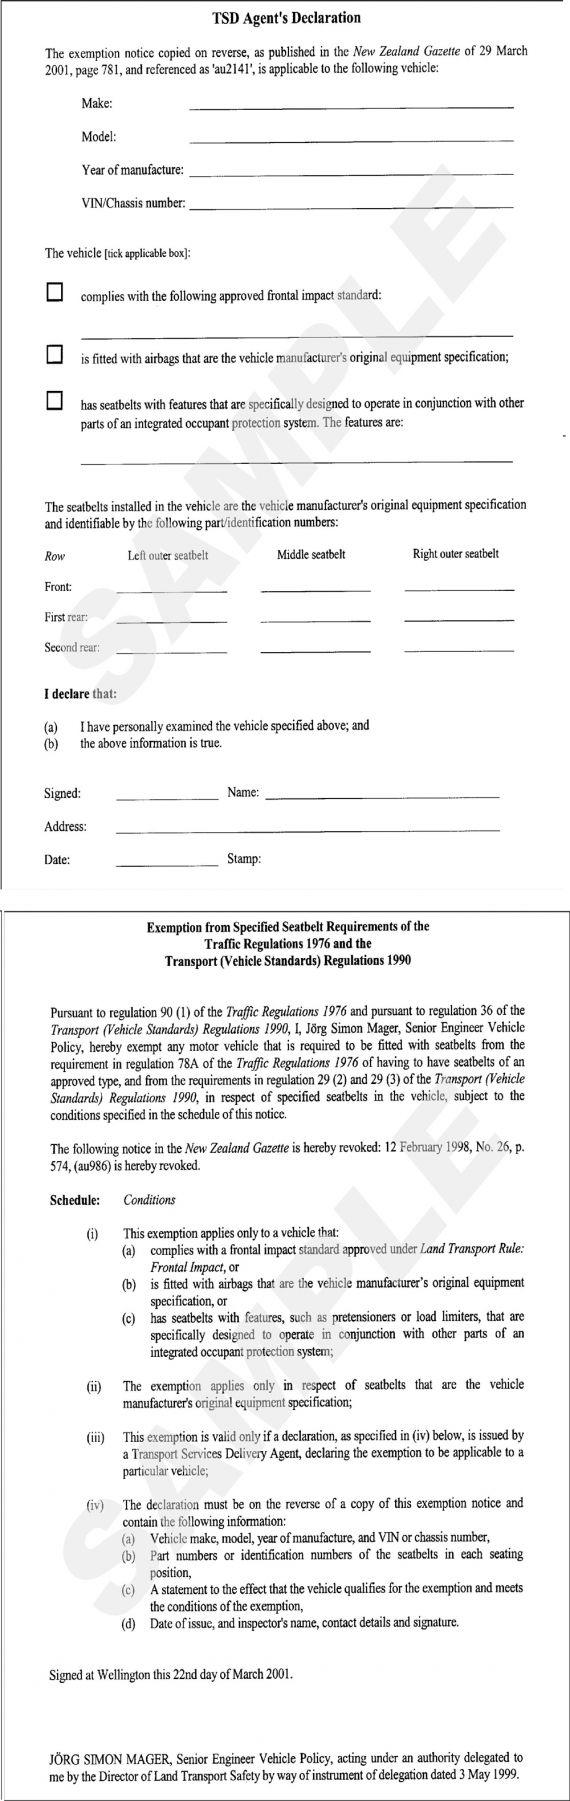 Figure 7-5-3. Example of seatbelt declaration: TSD Agent's Declaration